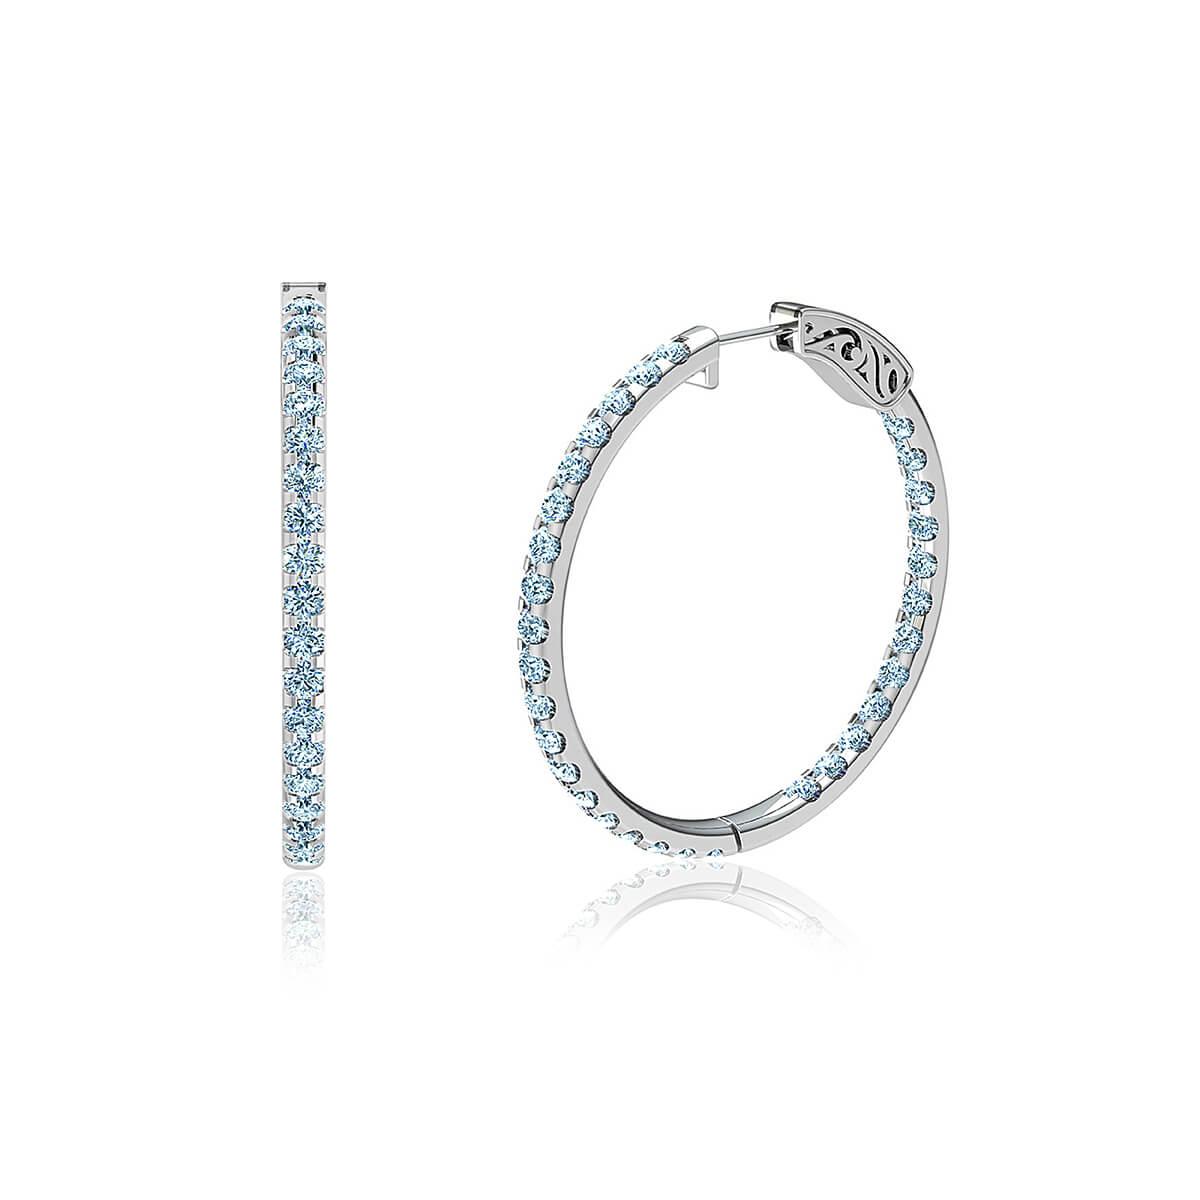 Solirosa Diamond Earrings (5 CT. TW.)